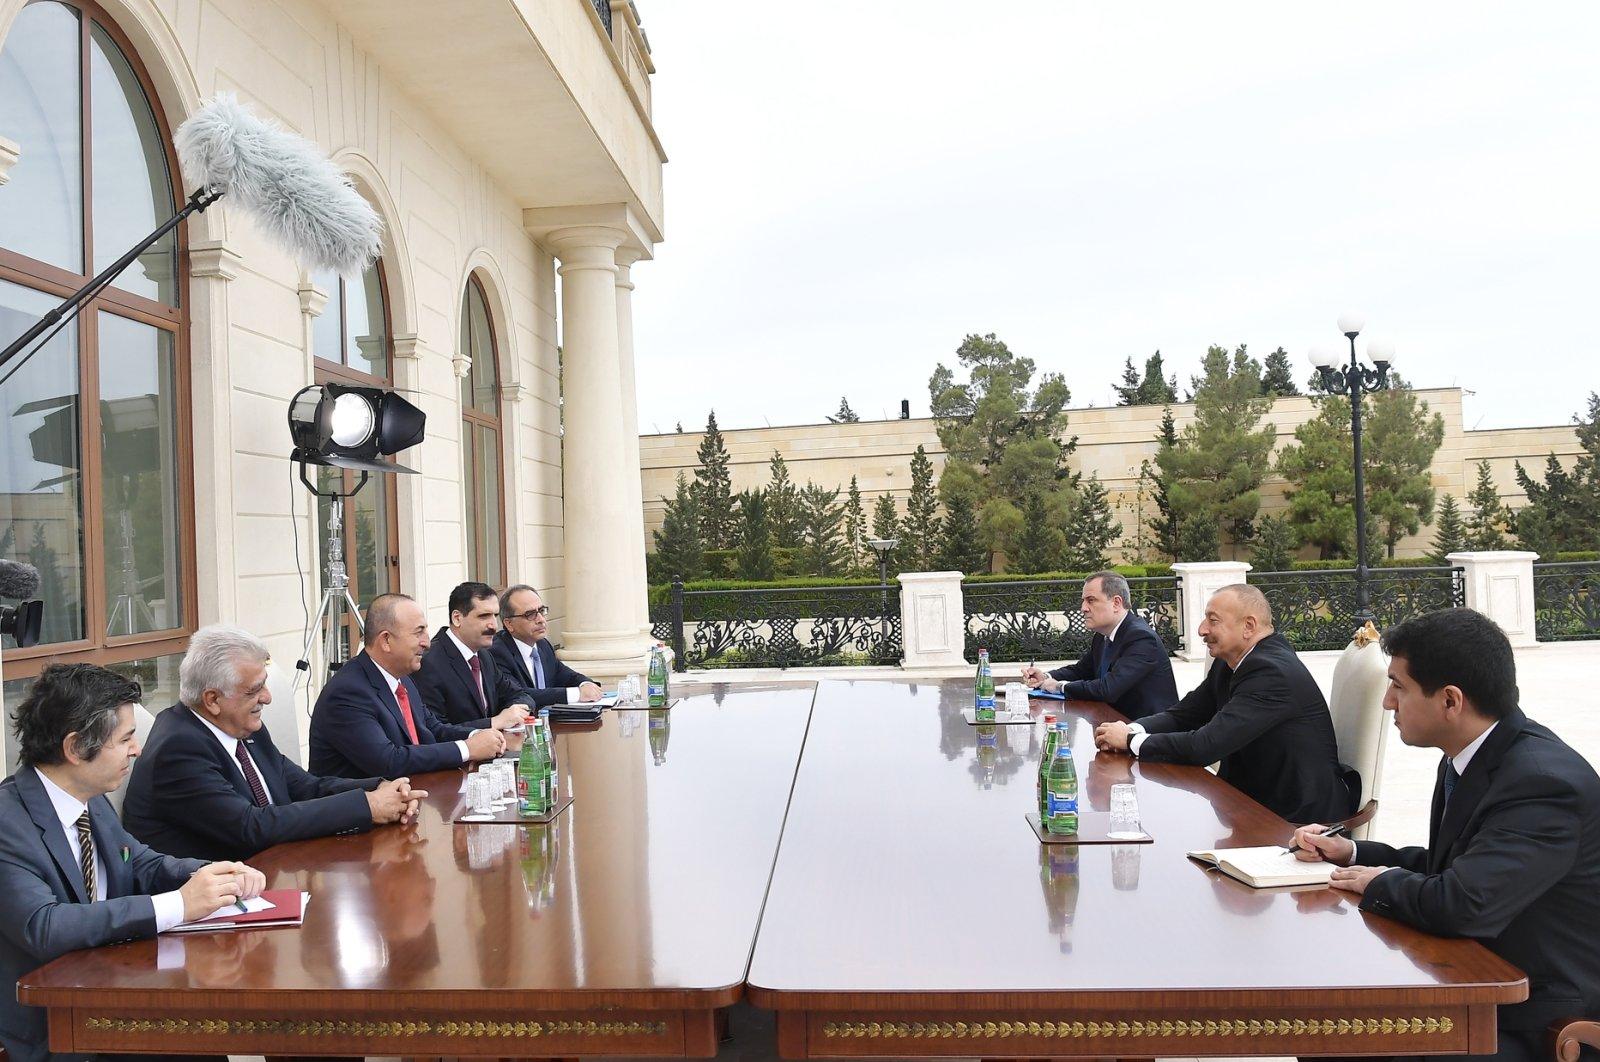 Foreign Minister Mevlüt Çavuşoğlu attends a meeting with Azerbaijani President Ilham Aliyev in Baku, Azerbaijan, Oct. 6, 2020. (AA Photo)